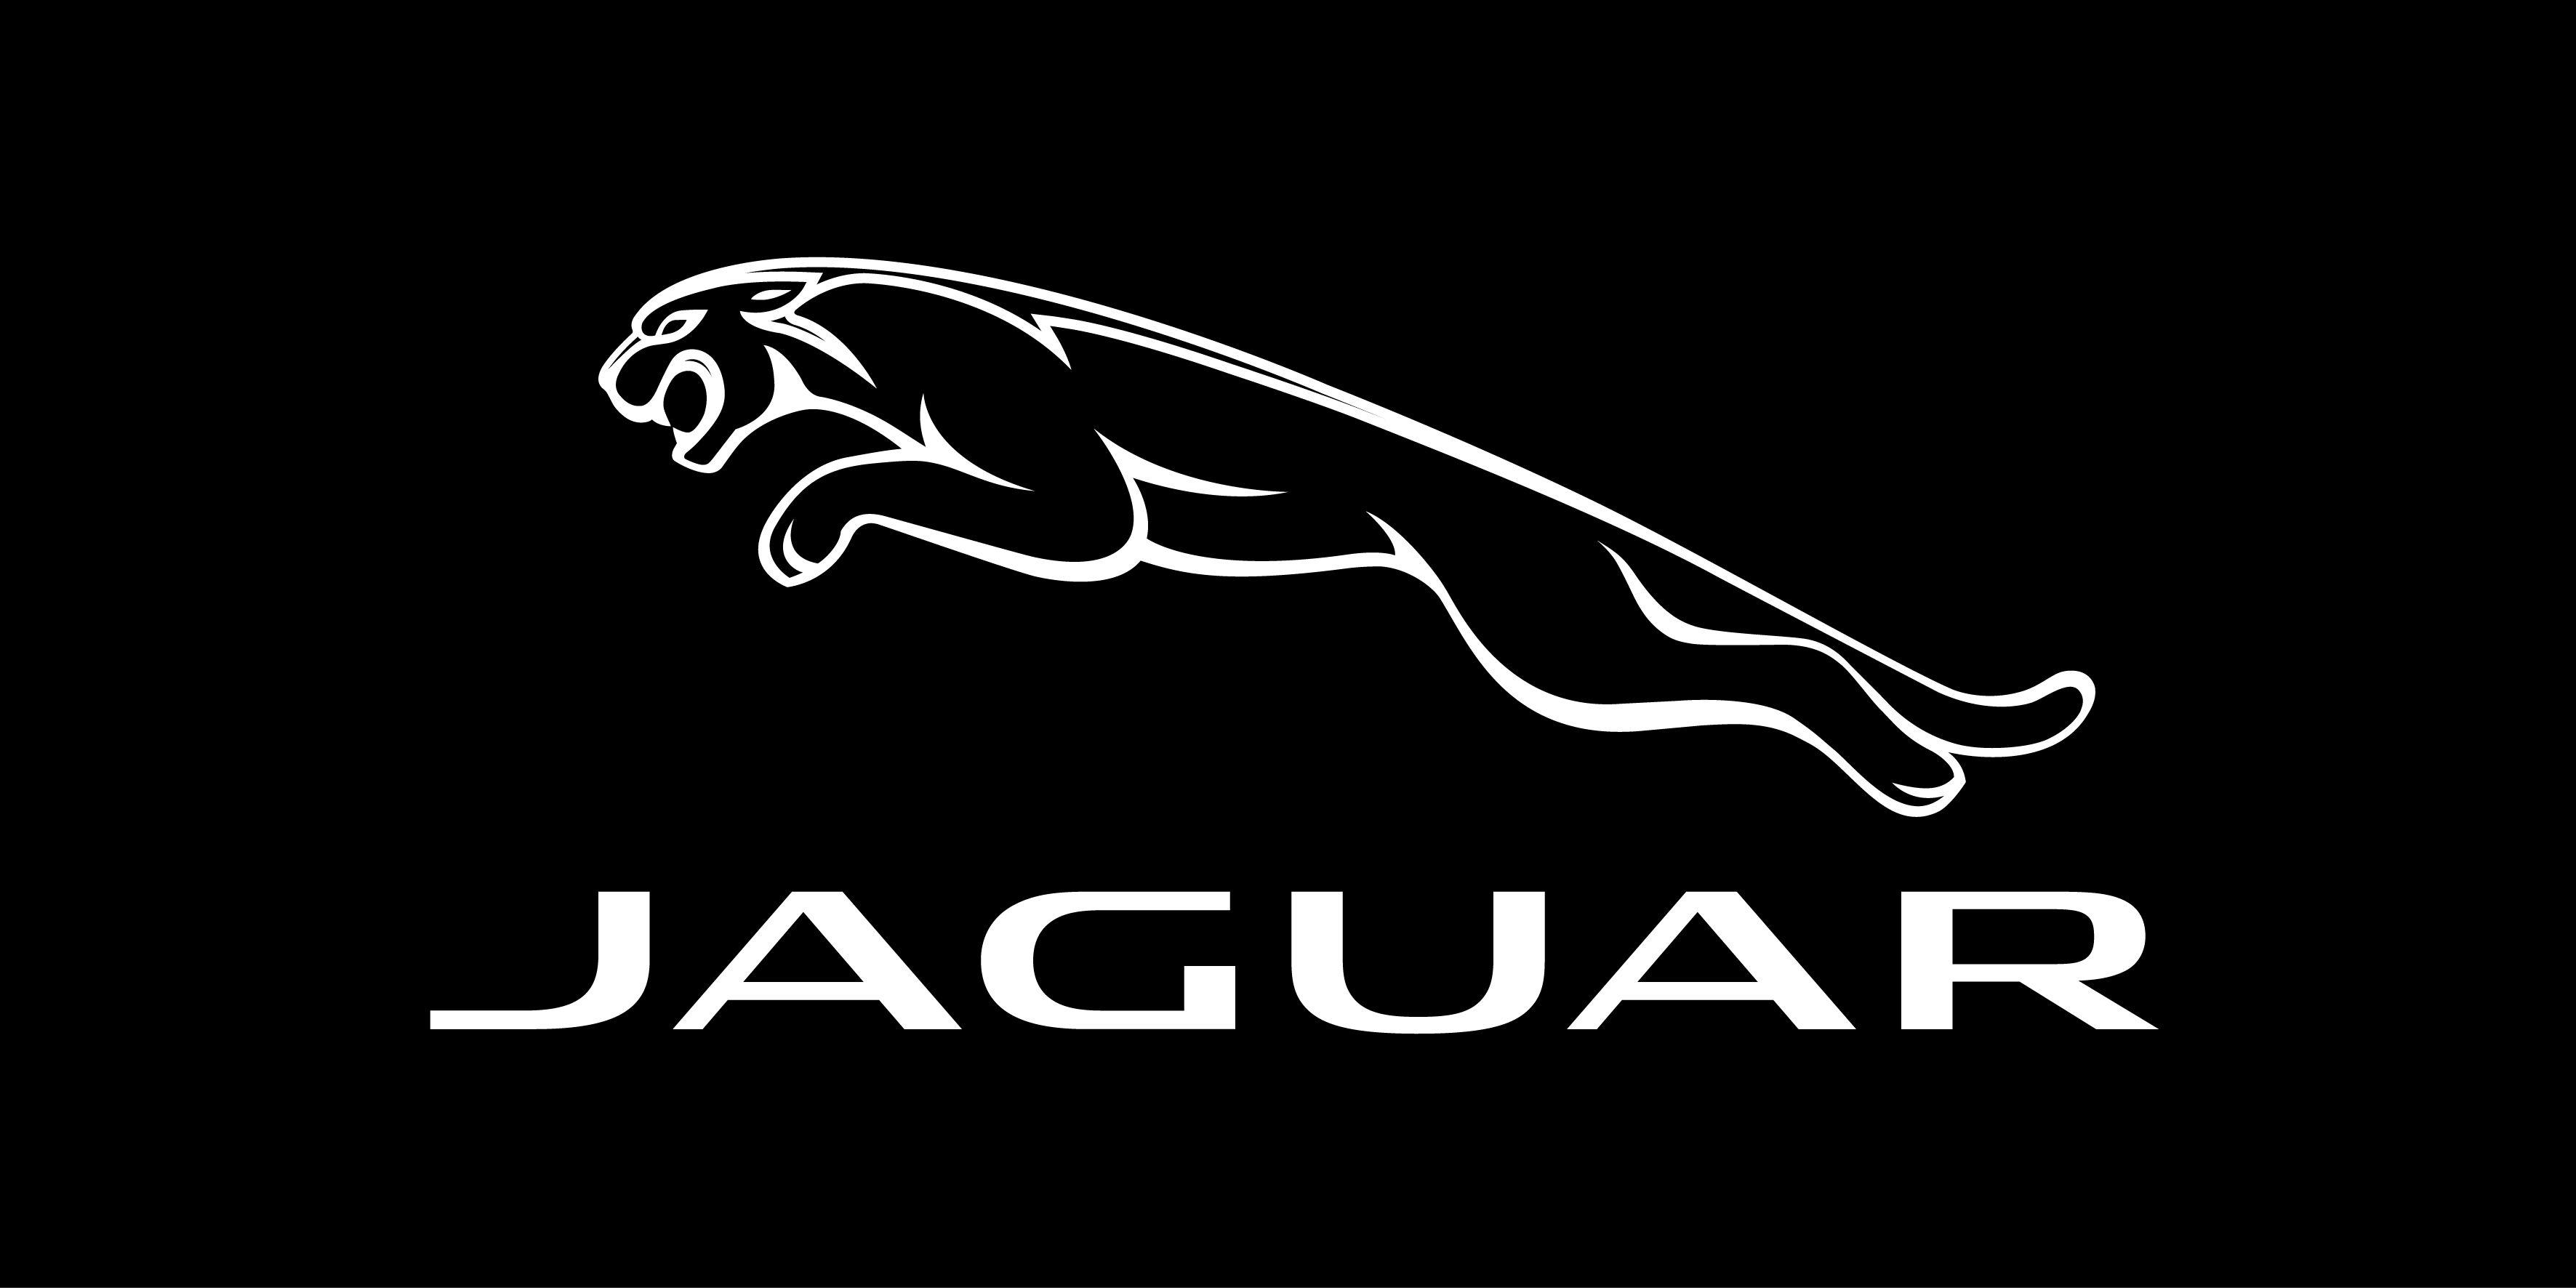 Jaguar Is The Luxury Vehicle Brand Of Jaguar Land Rover A British